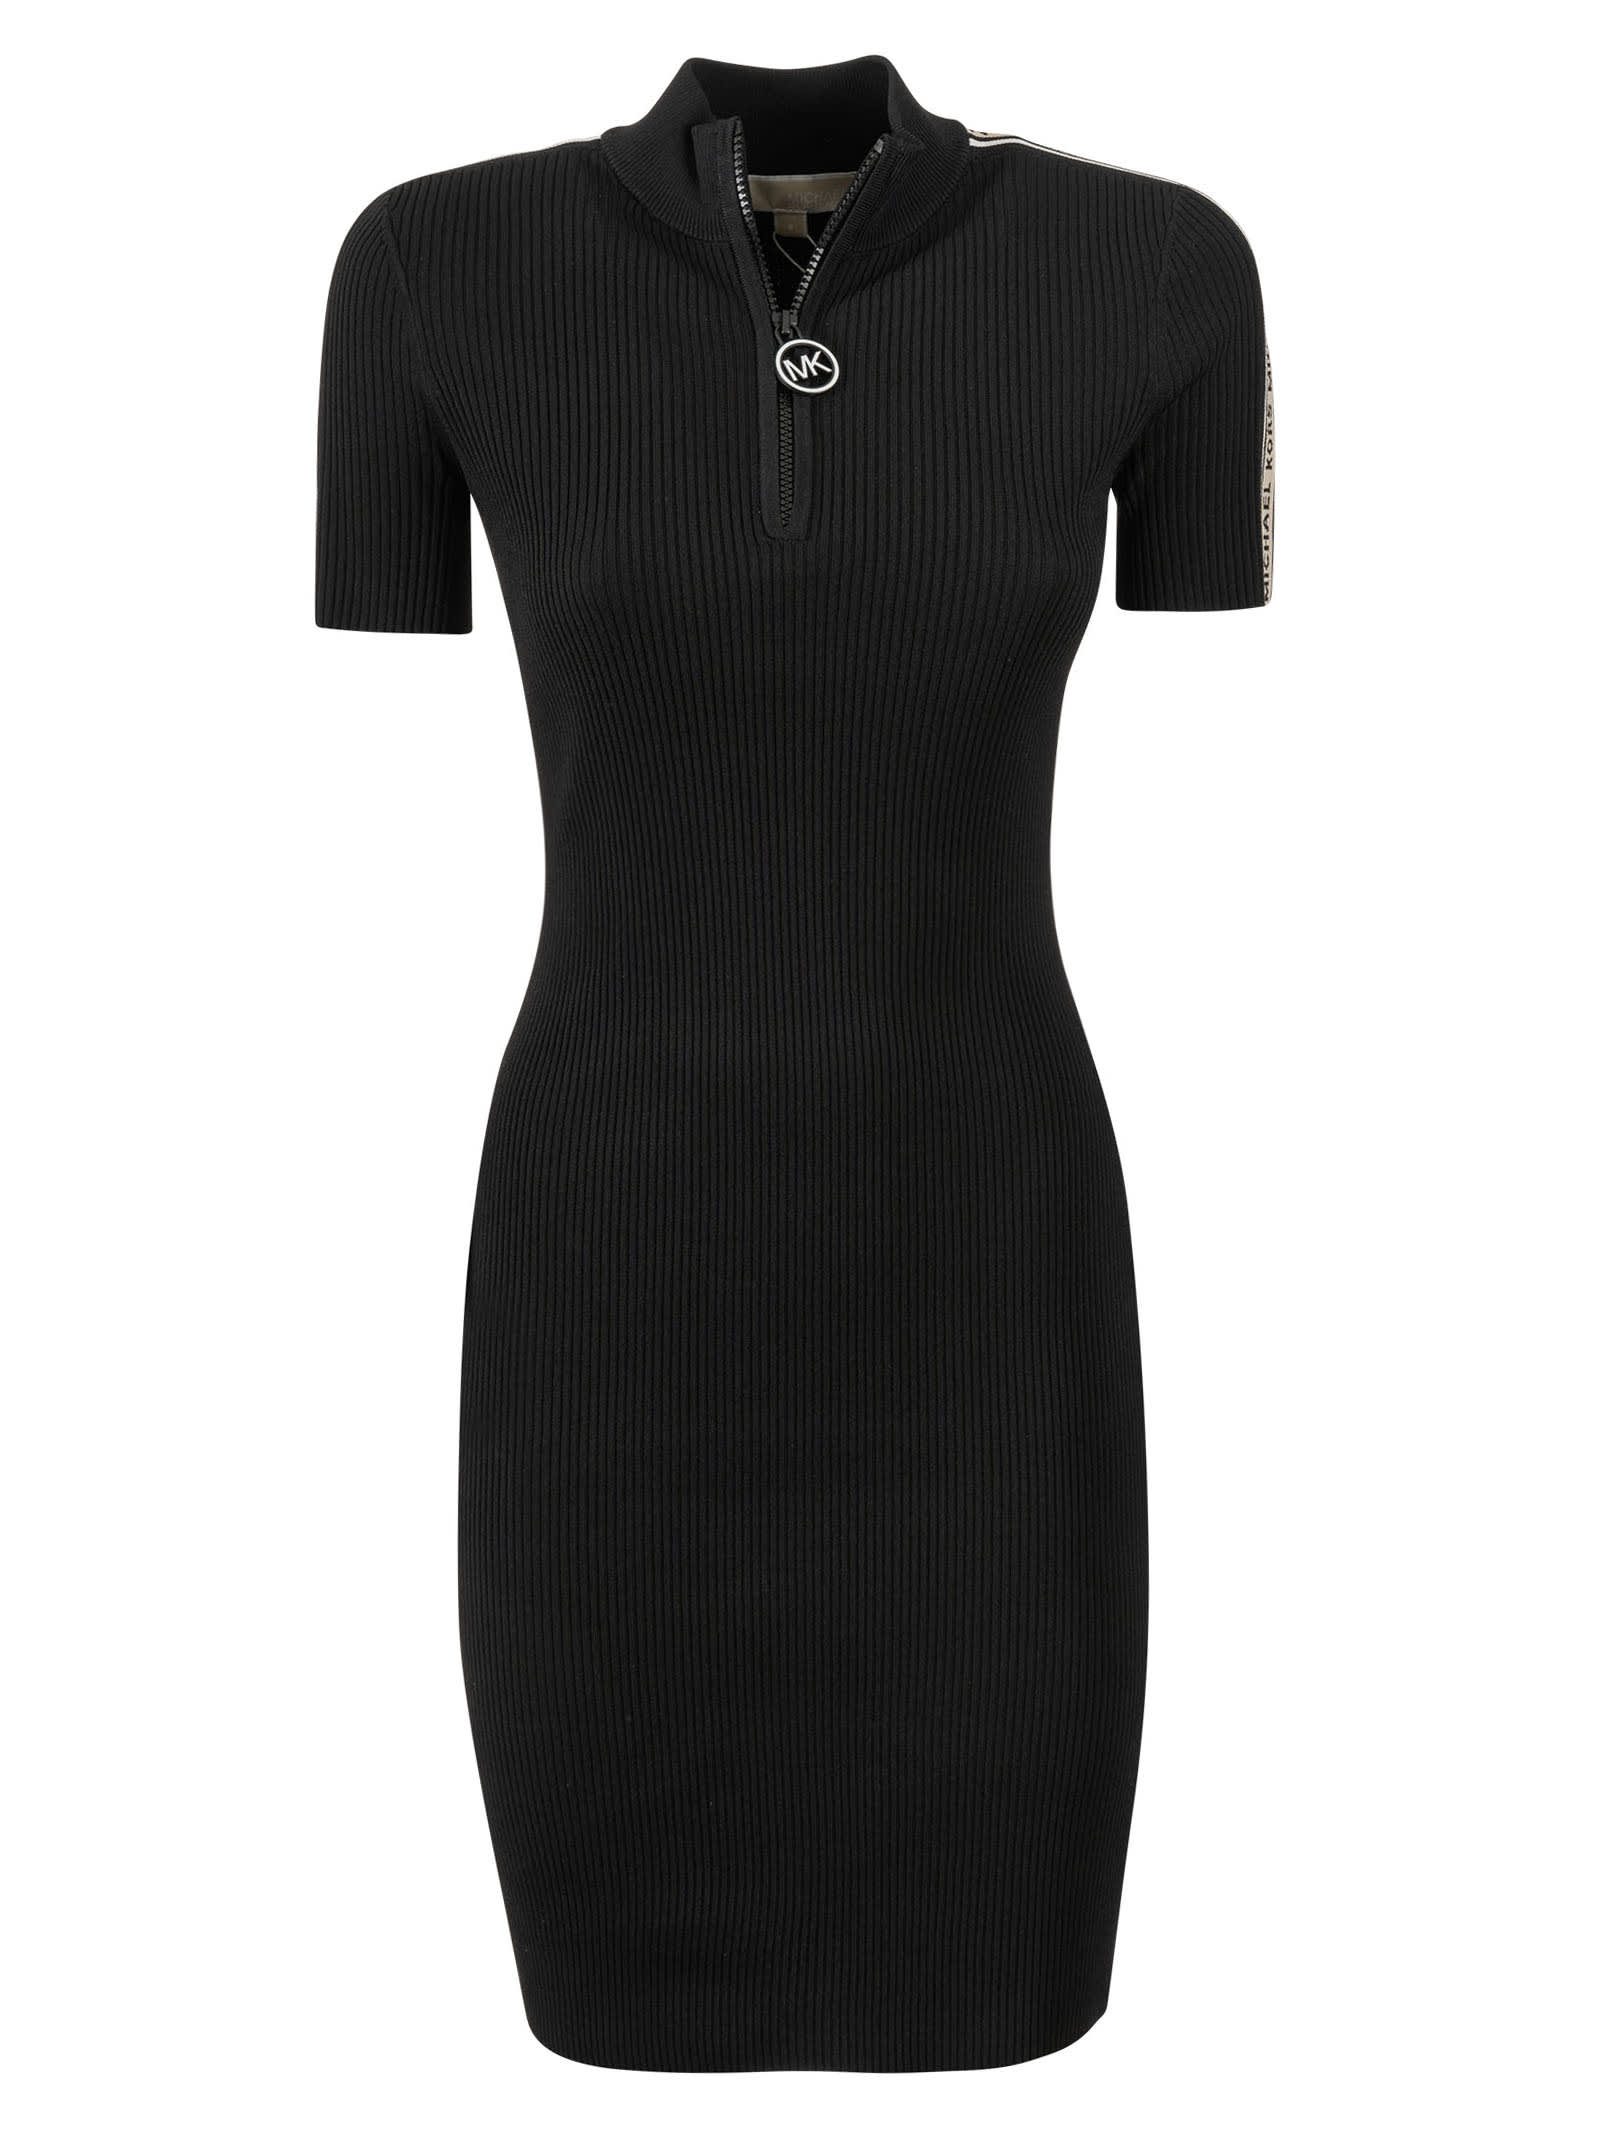 Buy MICHAEL Michael Kors Zipped Placket Slim Dress online, shop MICHAEL Michael Kors with free shipping